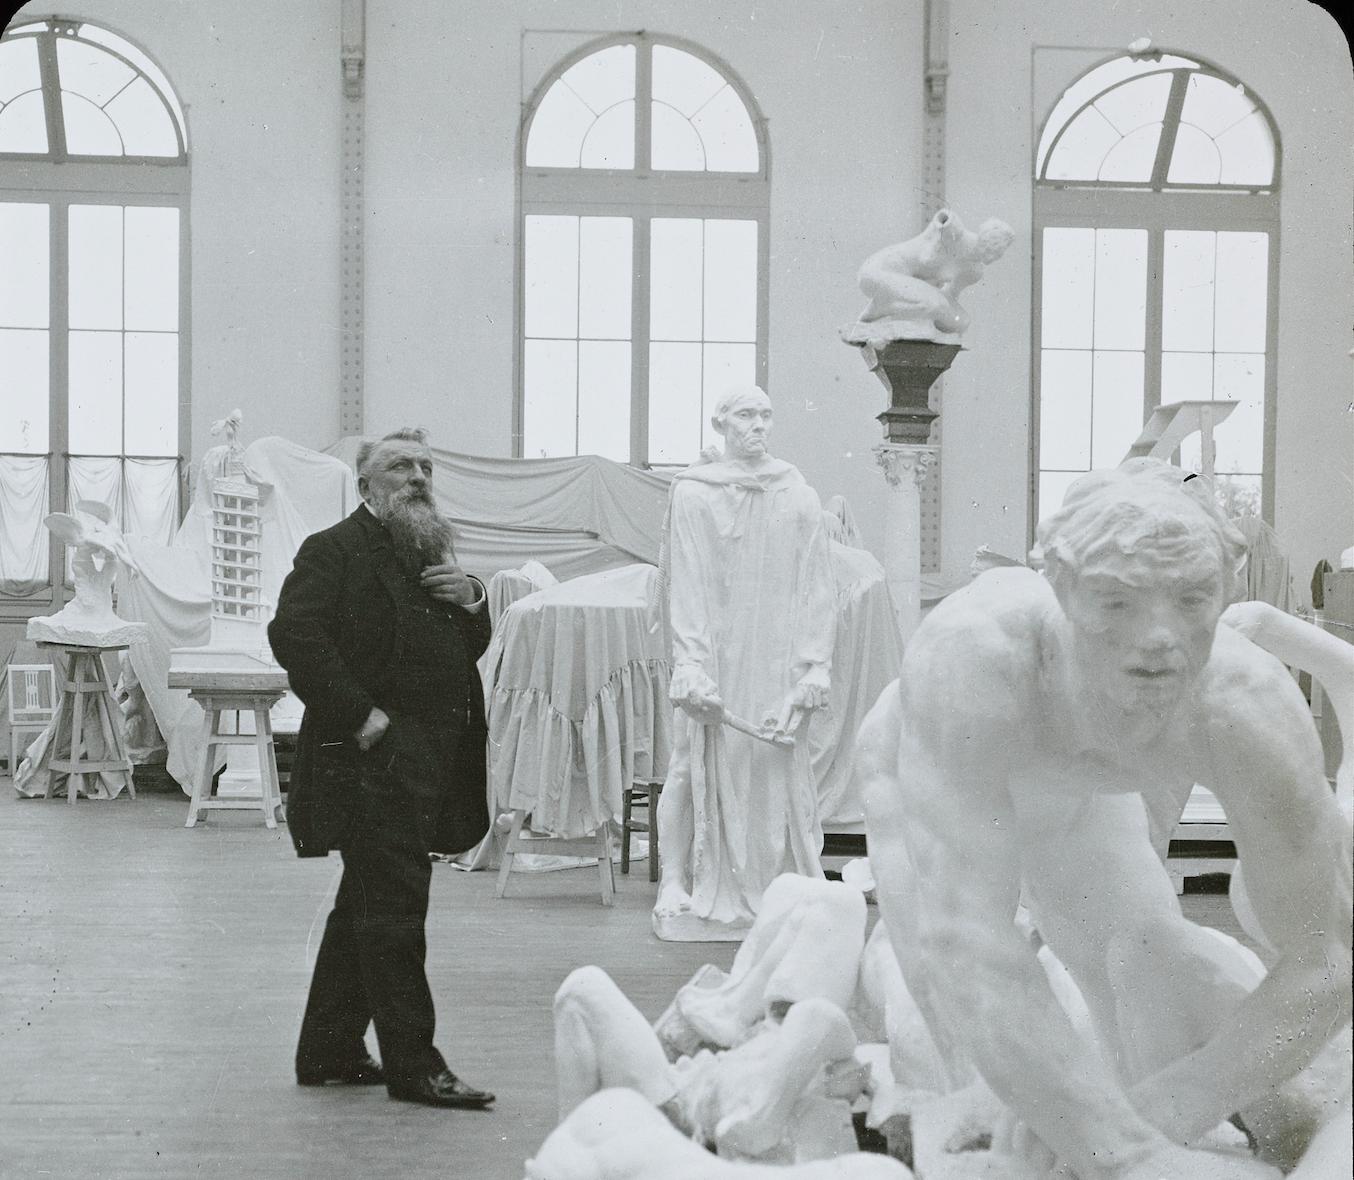 Jules Richard Rodin dans son atelier Musée Rodin, Ph.02392 © Musée Rodin